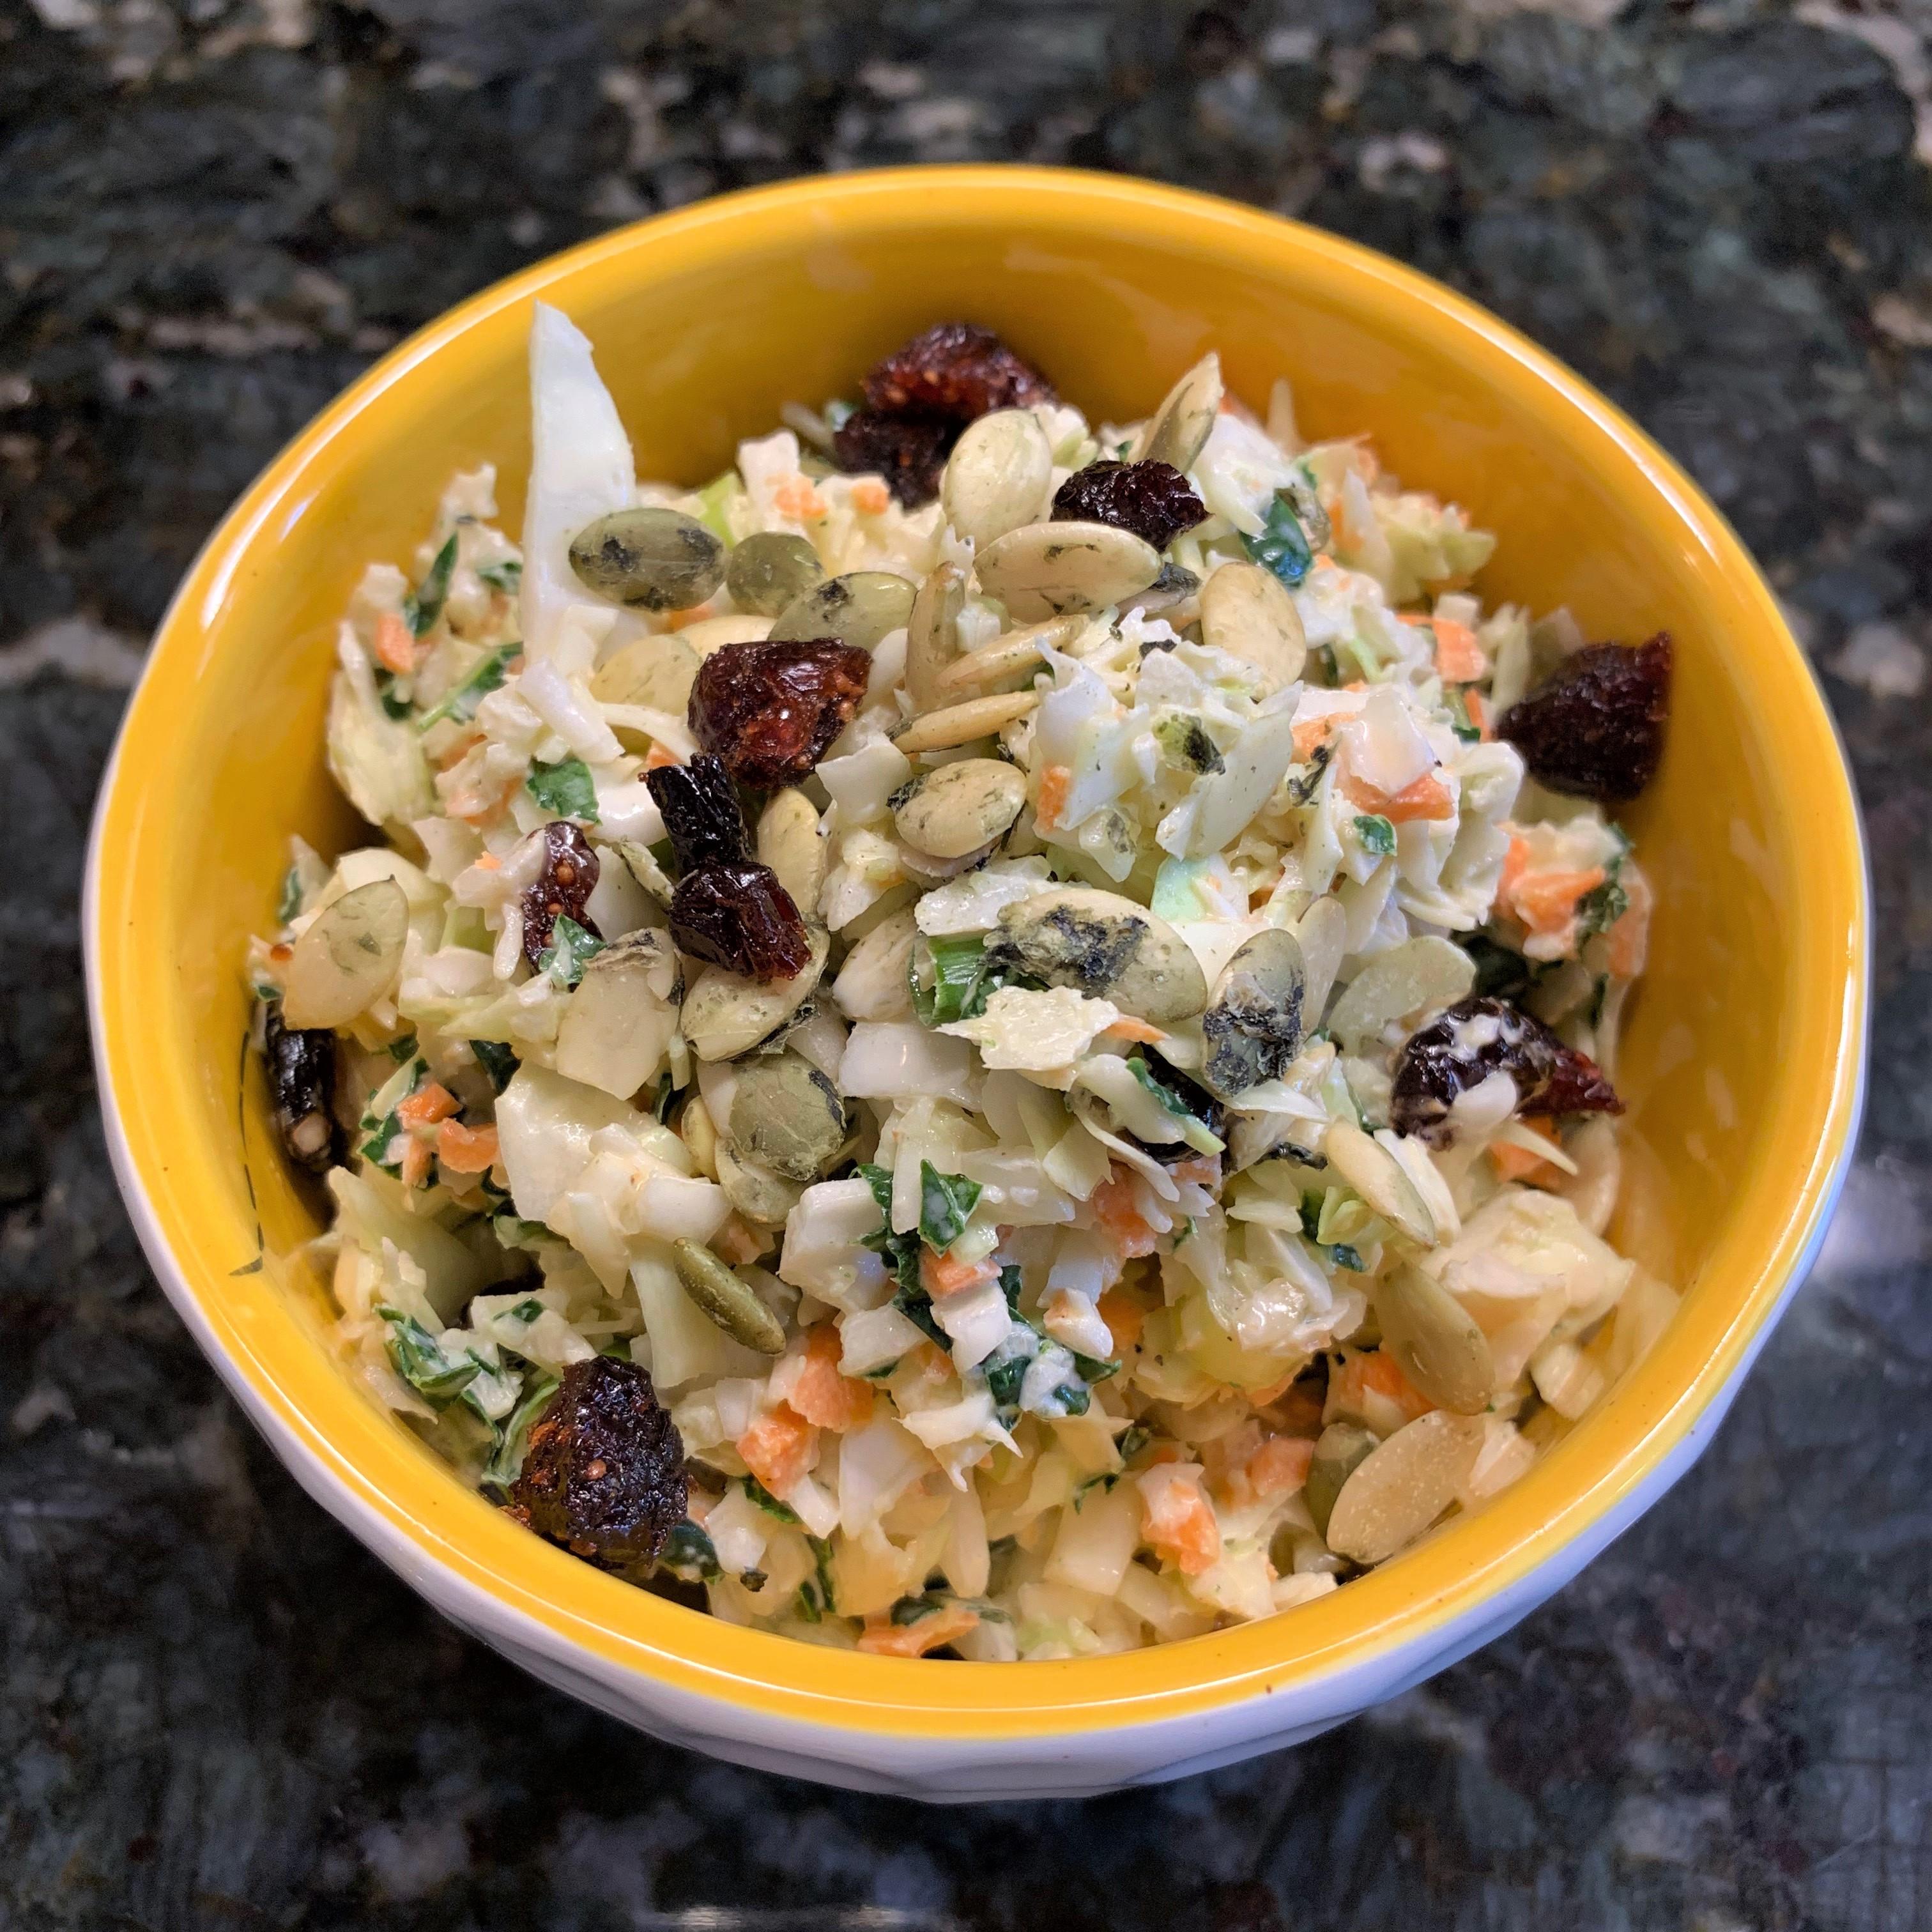 Kale, Cranberry, Pumpkin Seed Slaw